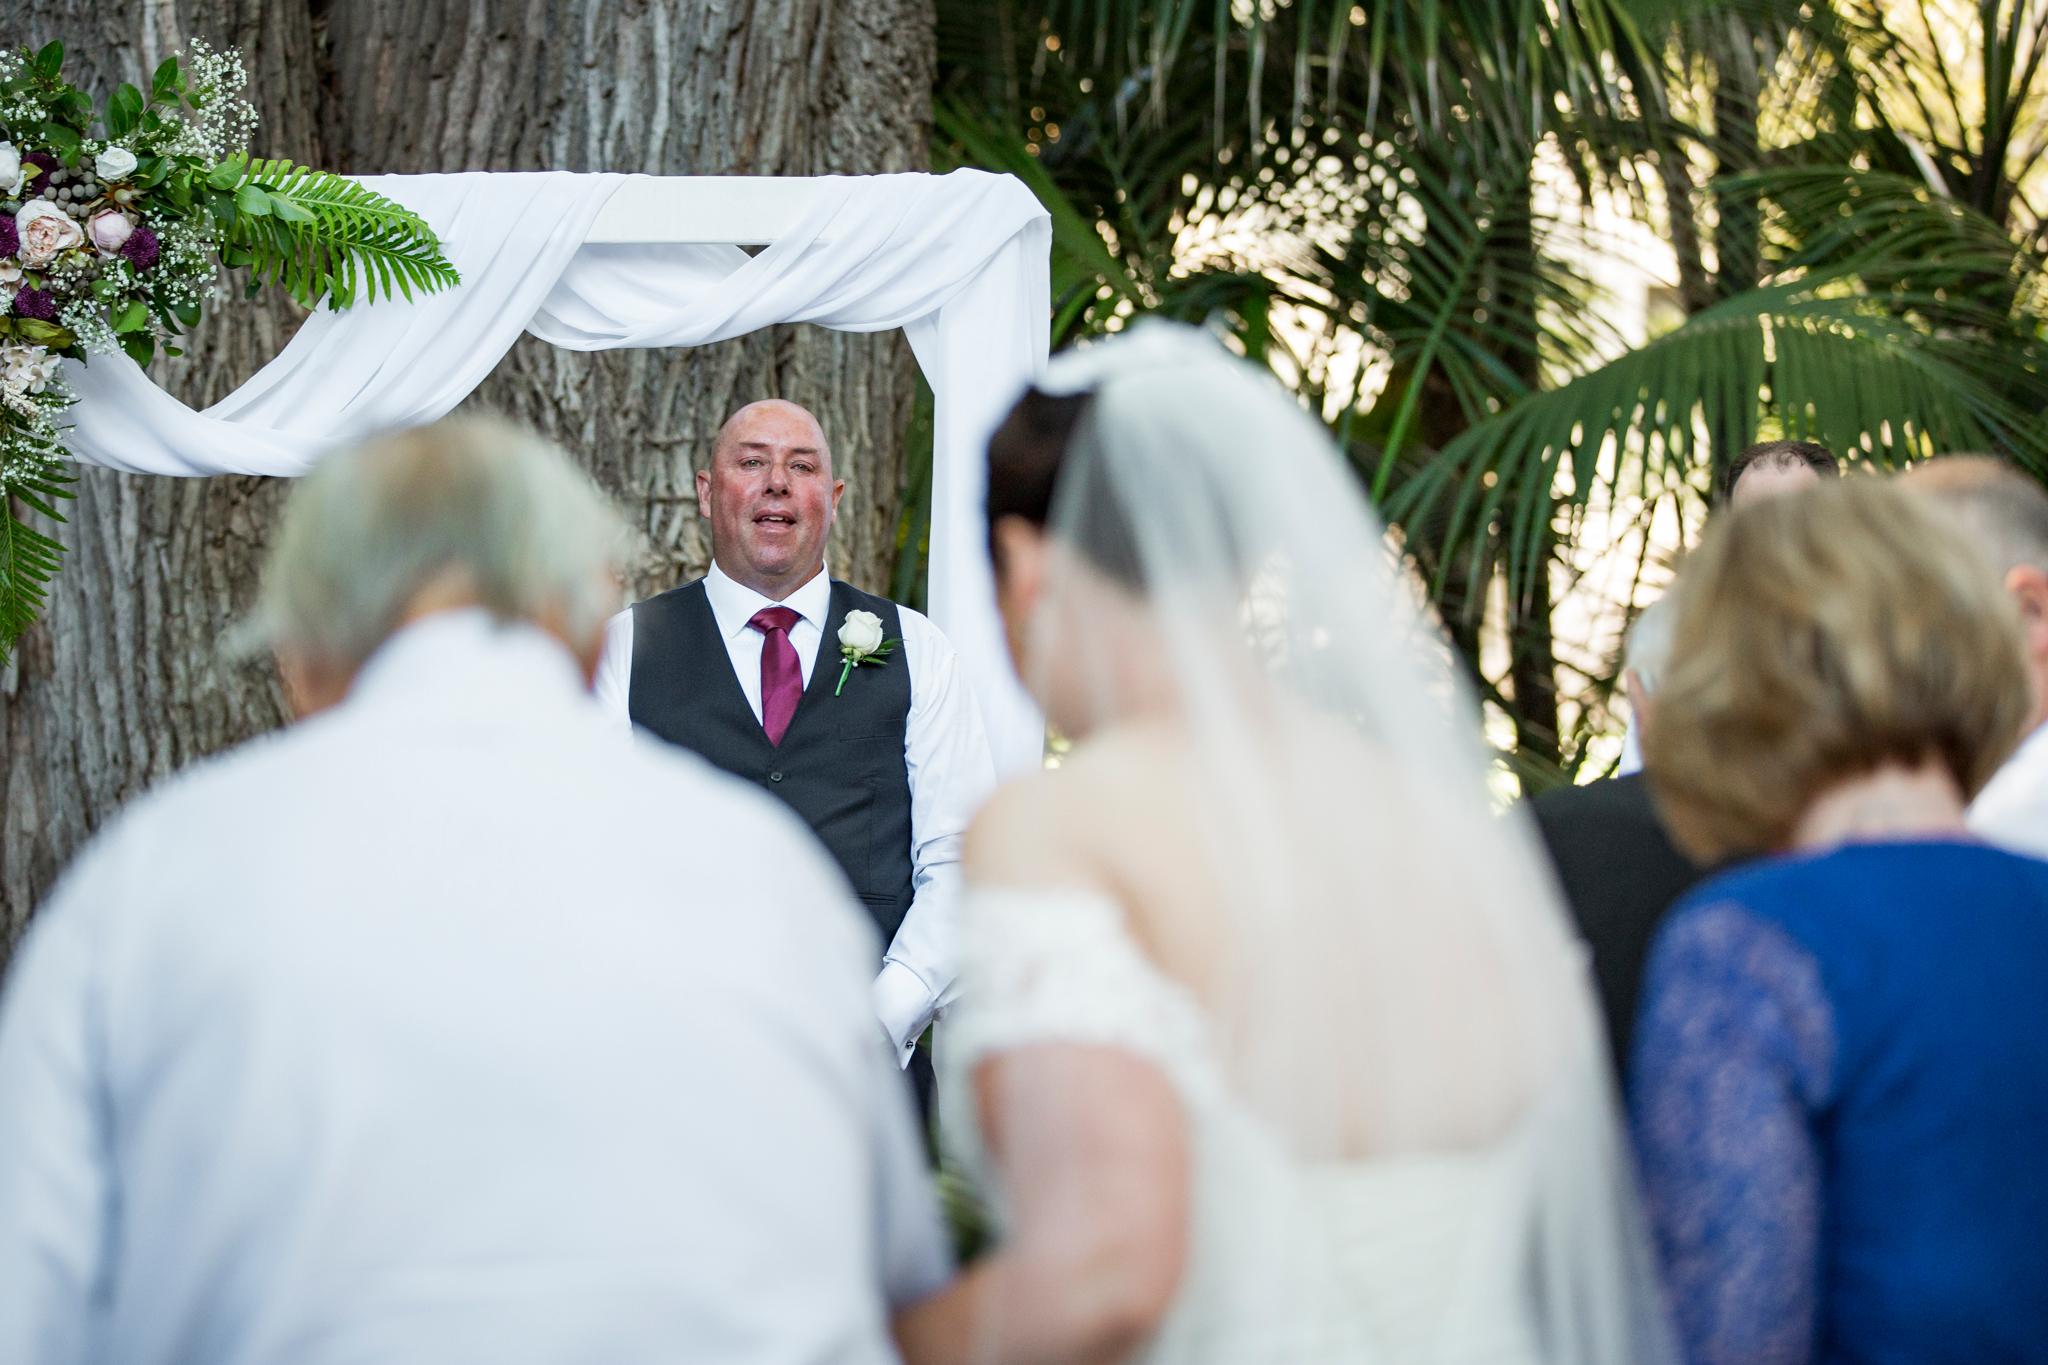 Kyme-steve-wedding-48.jpg